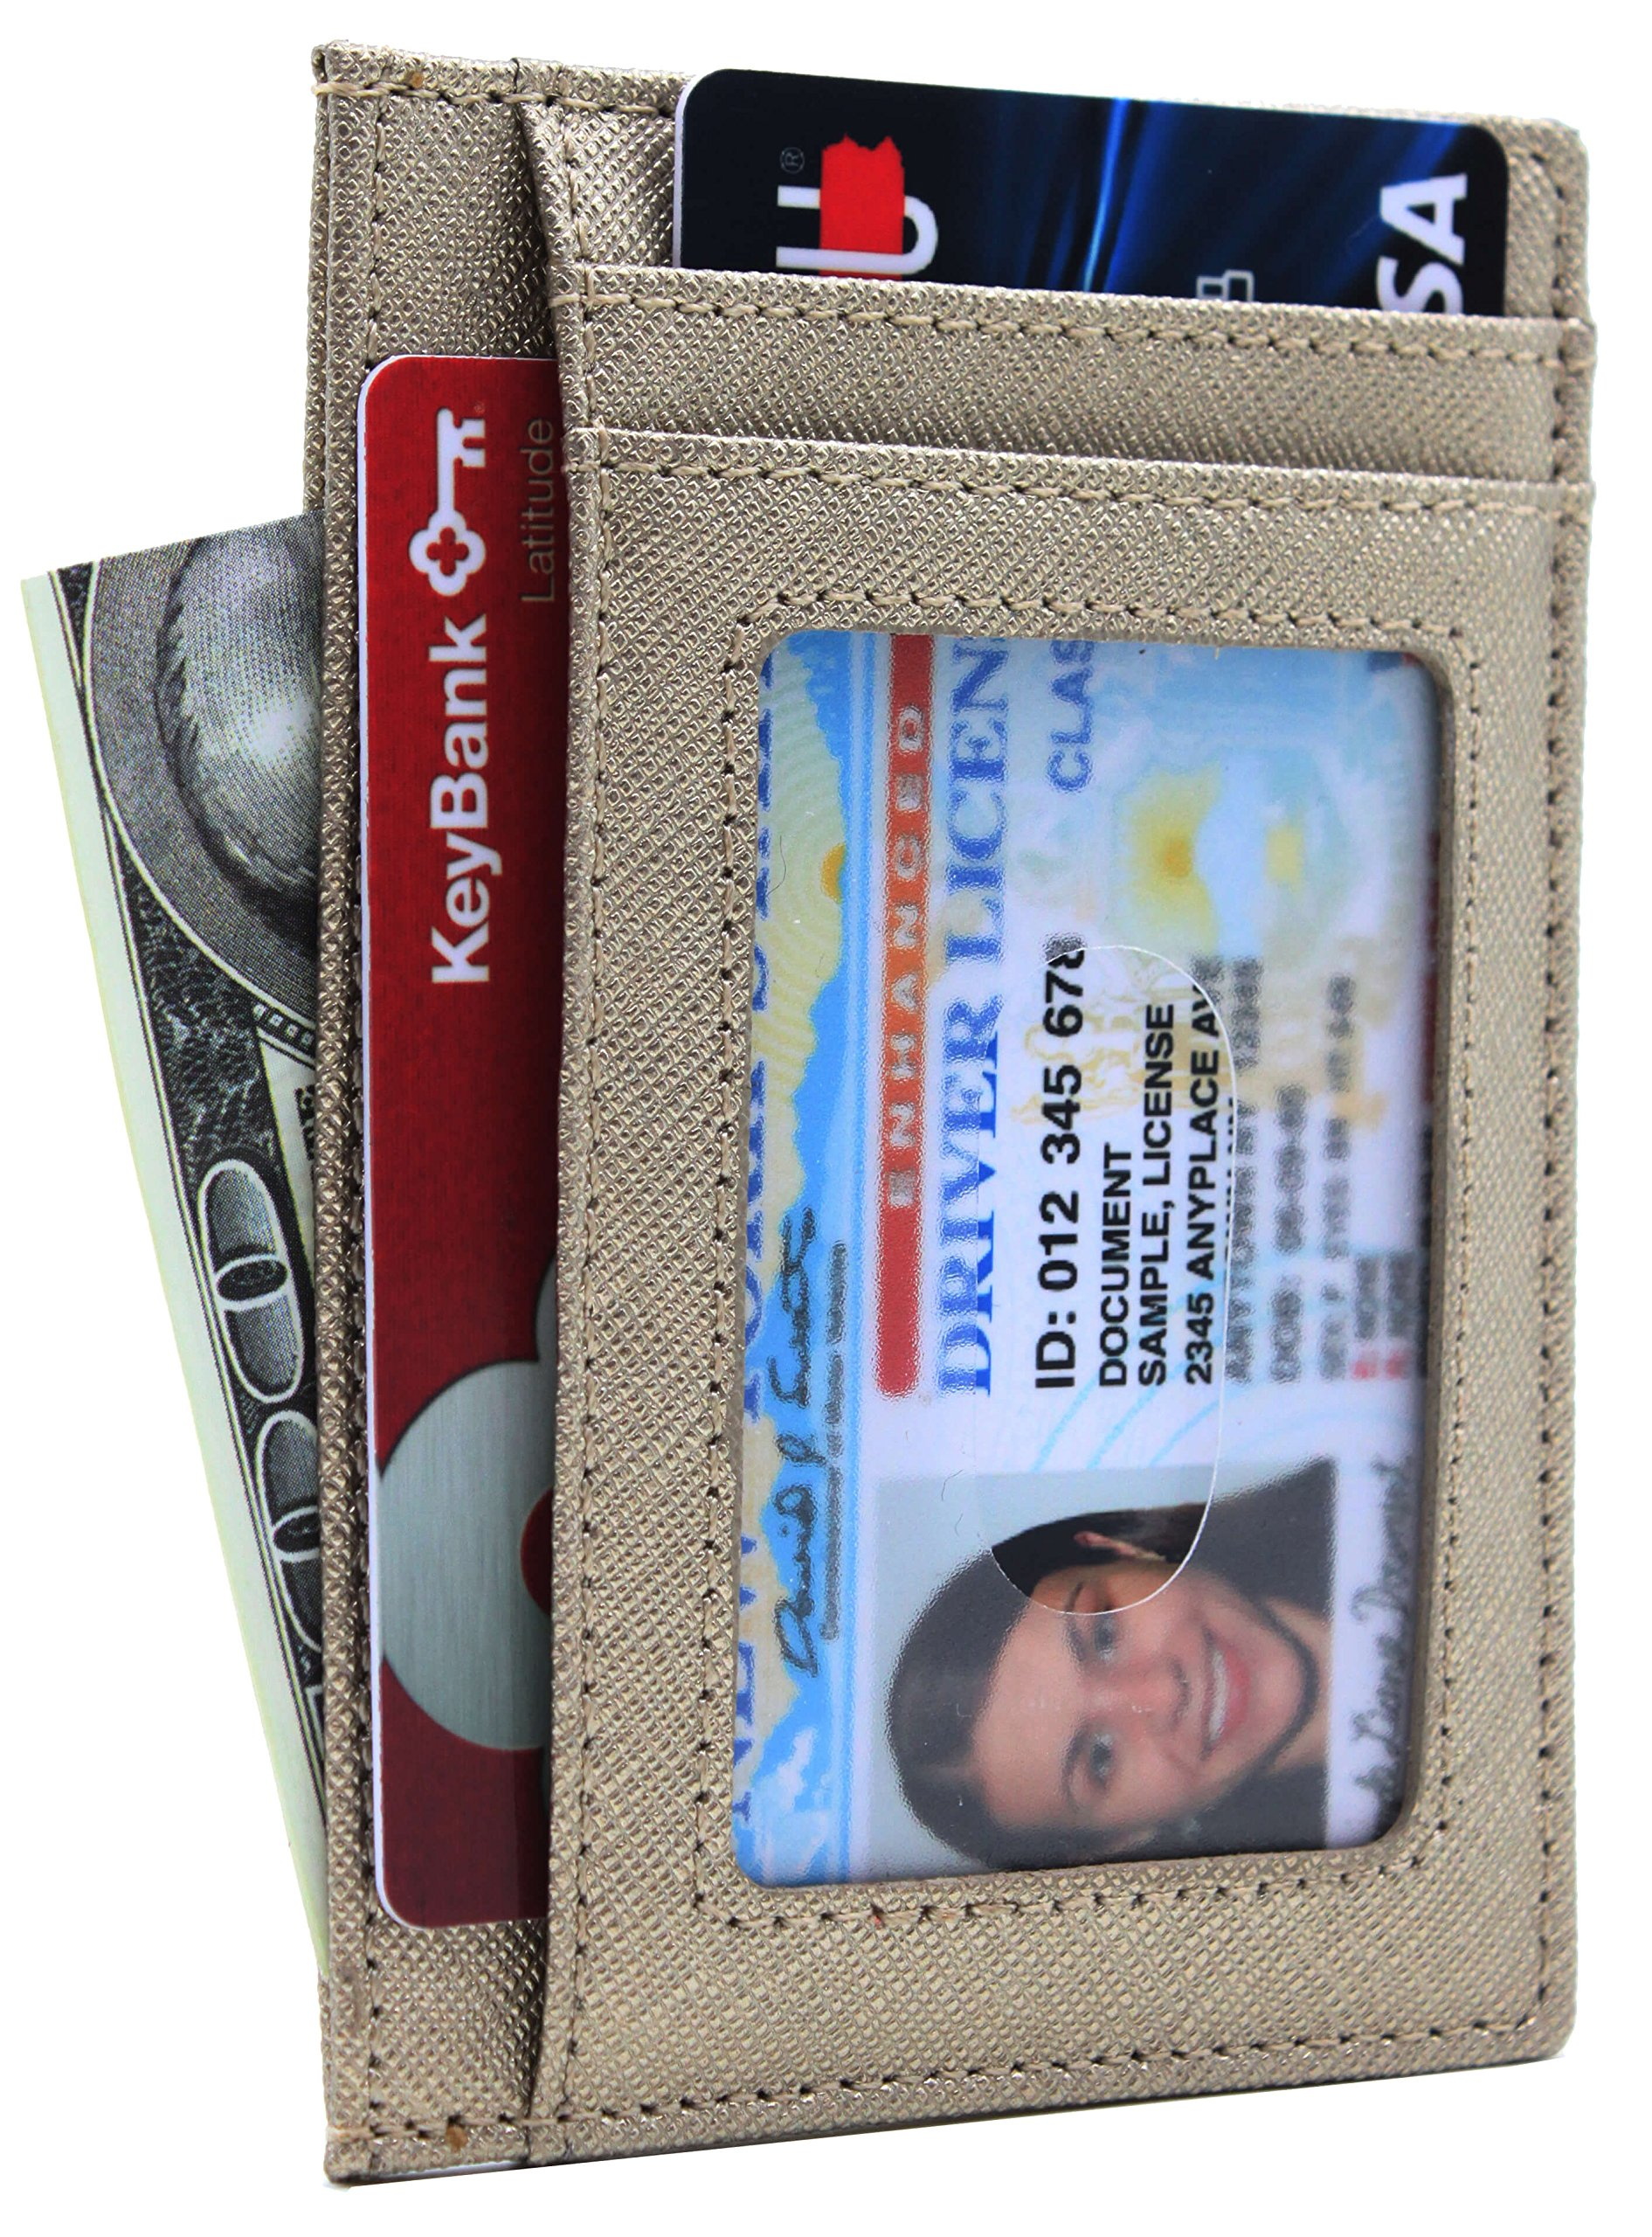 Small Genuine Leather RFID Blocking Minimalist Wallet Credit ID Card Holder Travel Slim Pocket Wallet Money Clip Men Women, Gold